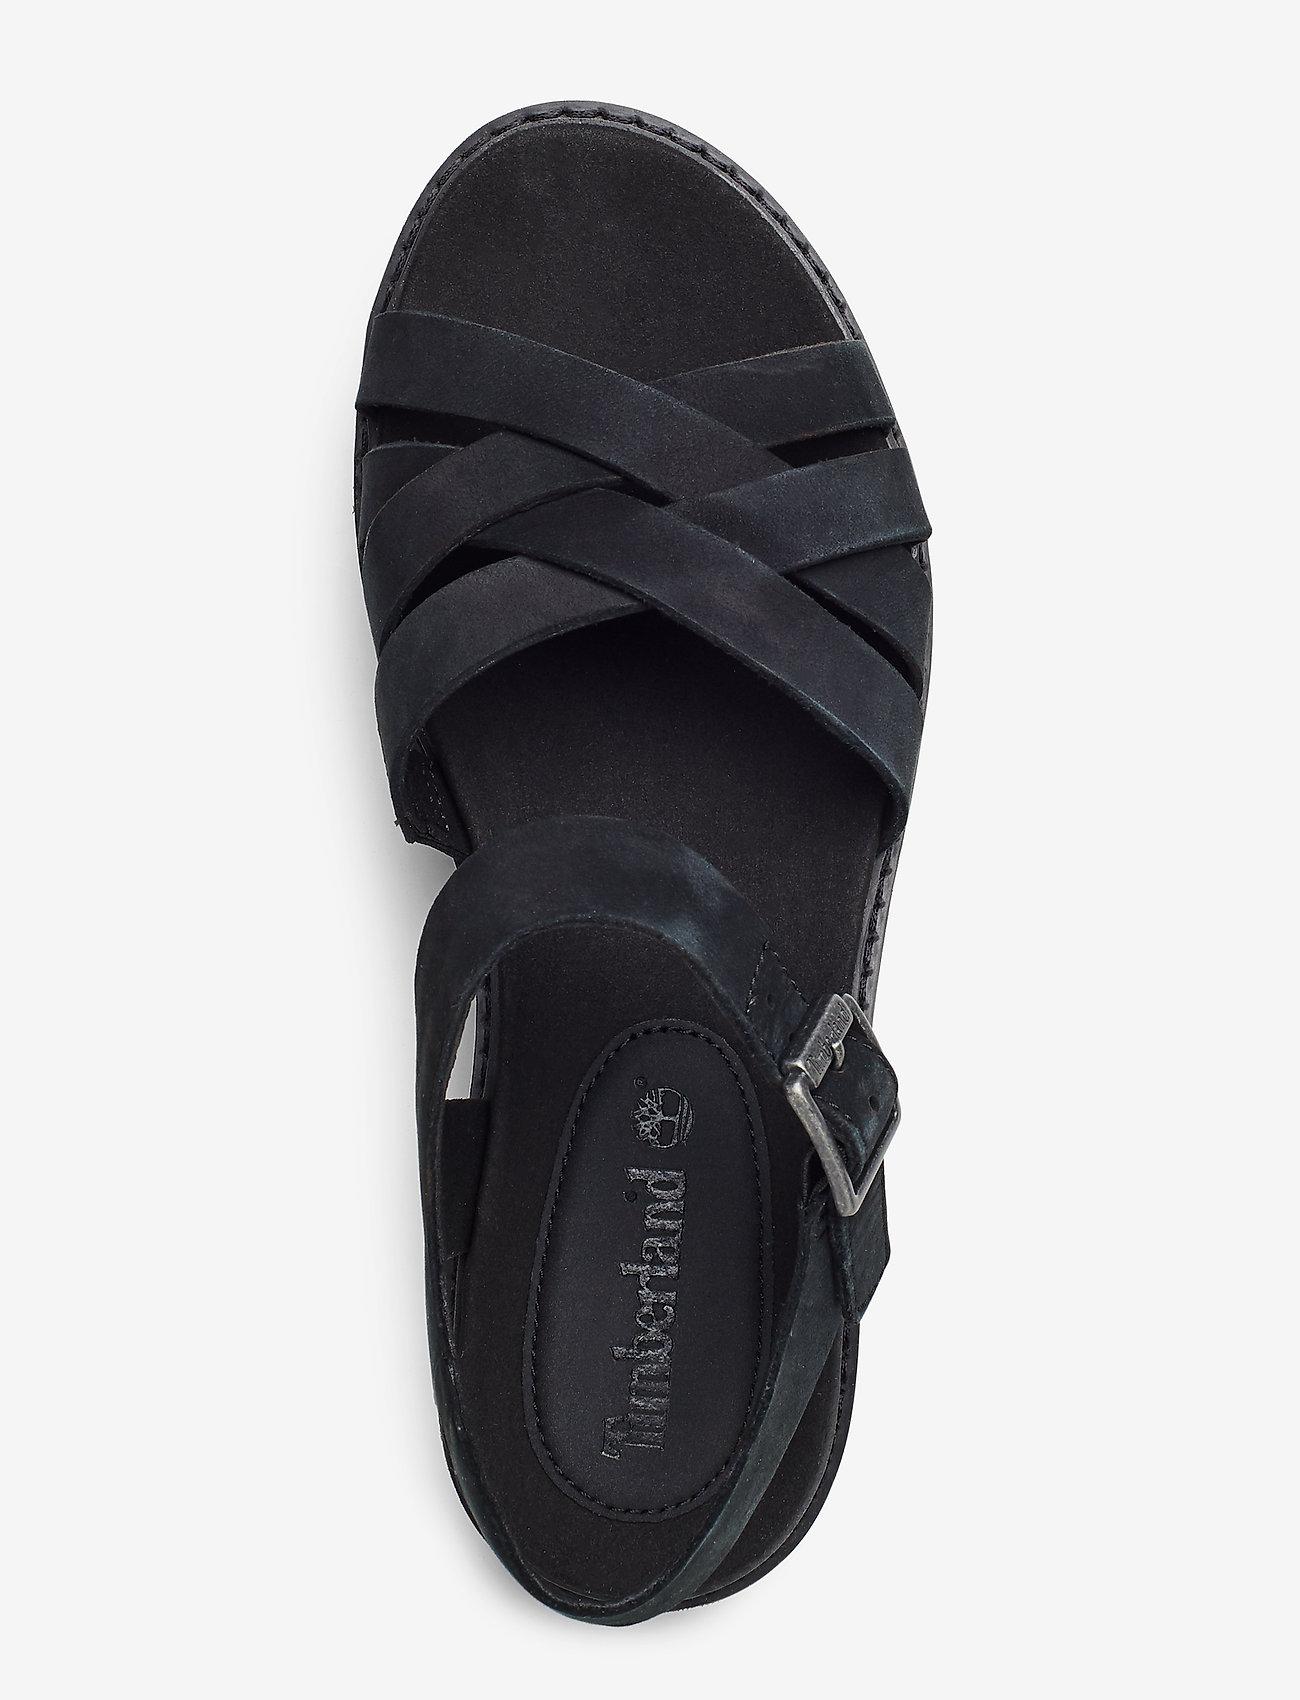 Safari Dawn Multi-strap Sandal (Jet Black) - Timberland